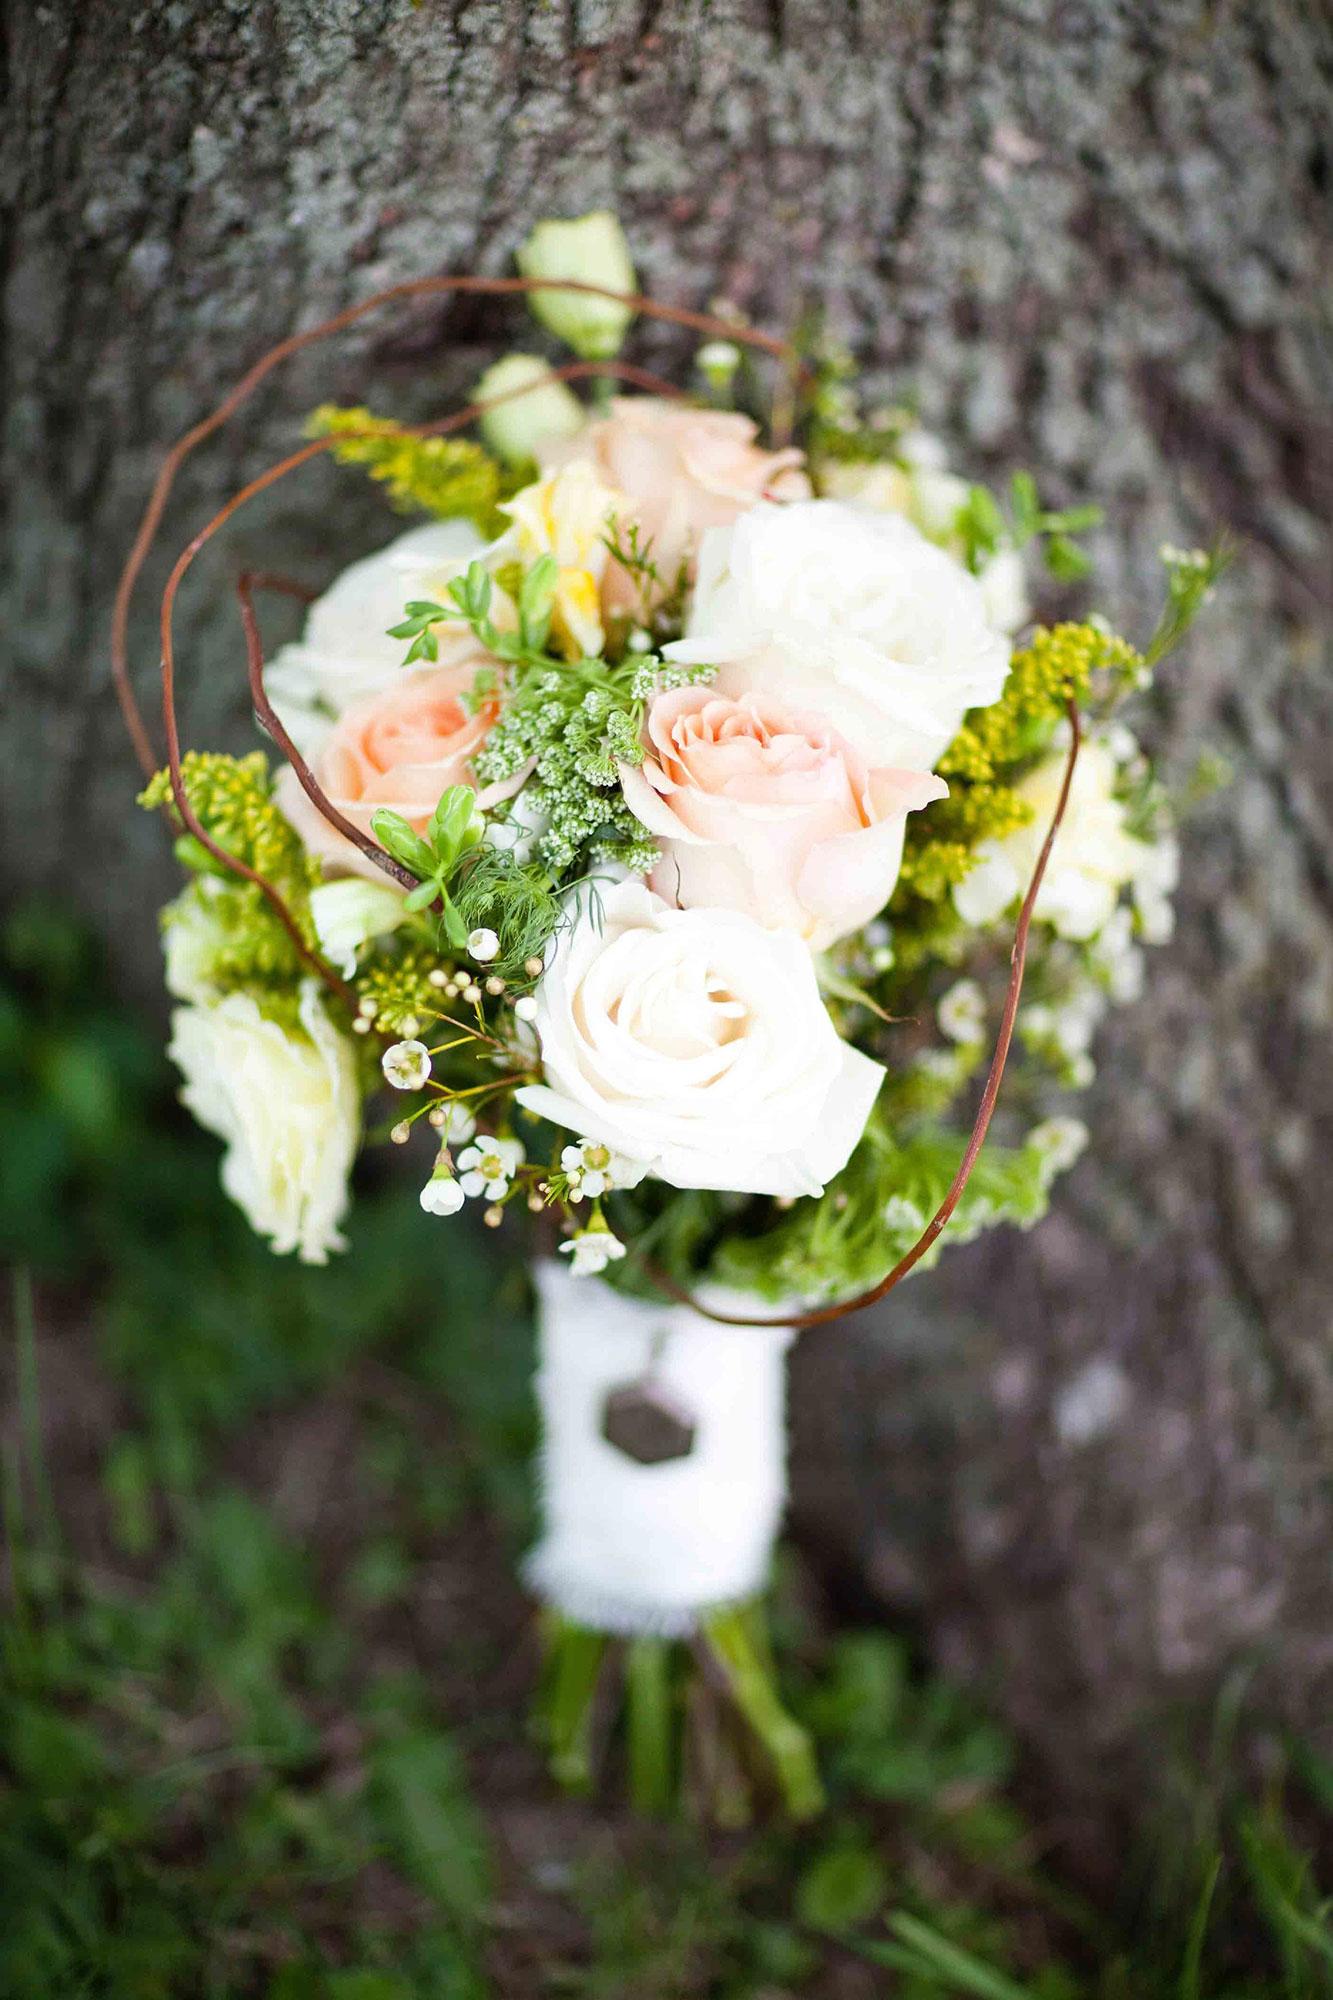 Amanda-Cowley-Willowbank-Vineyard-Bride-Photo-By-White-Photographie-019.jpg